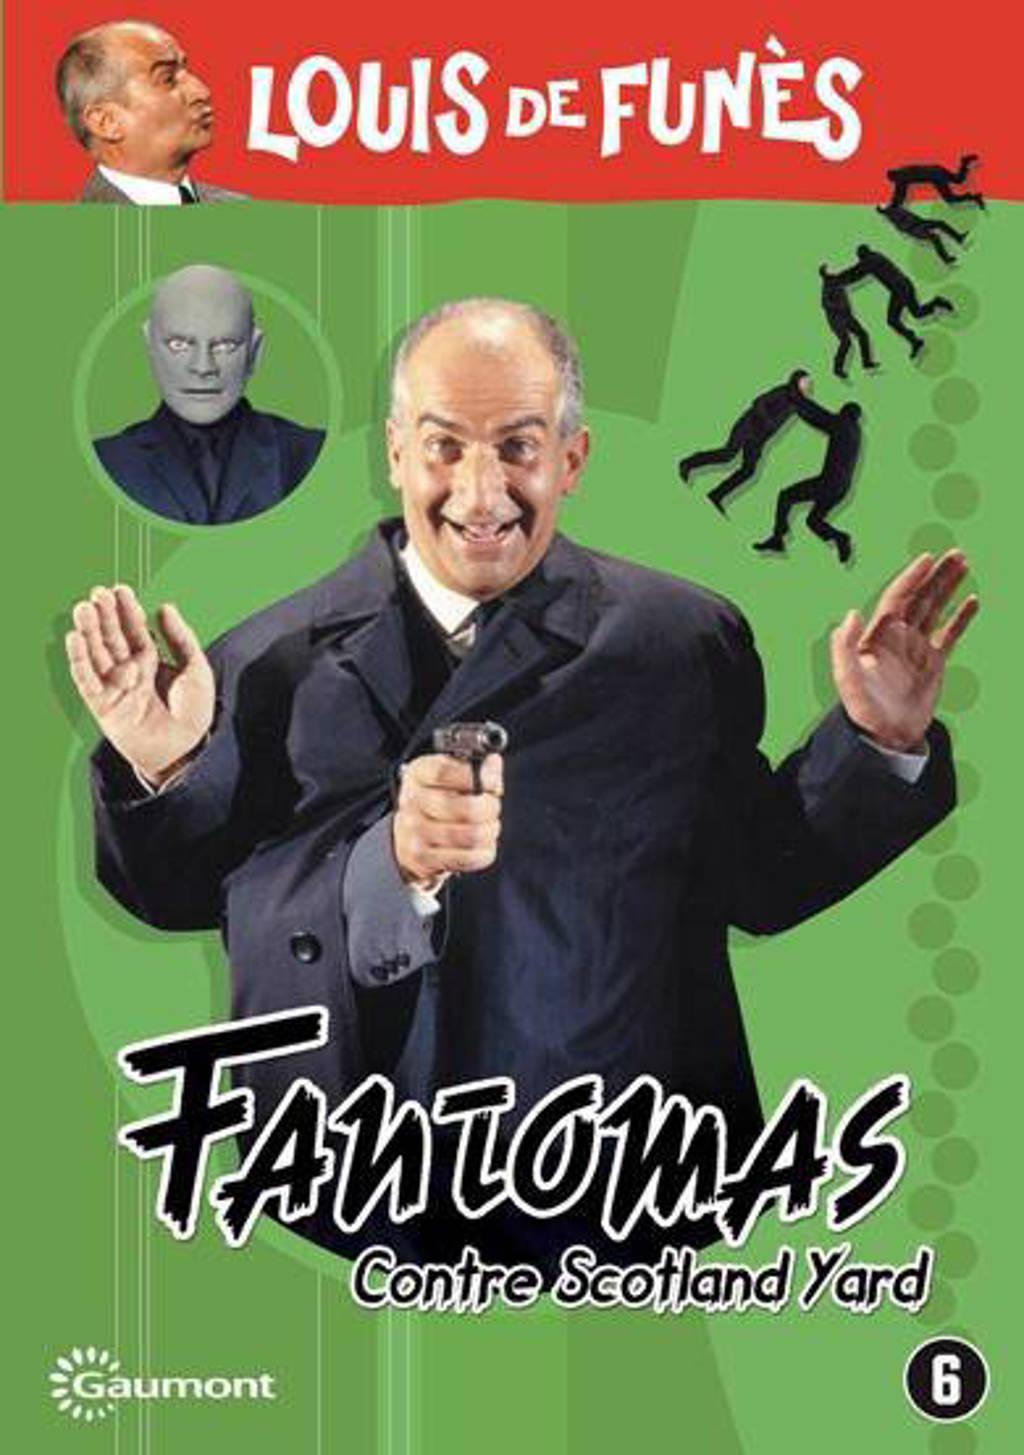 Fantomas contre Scotland Yard (DVD)